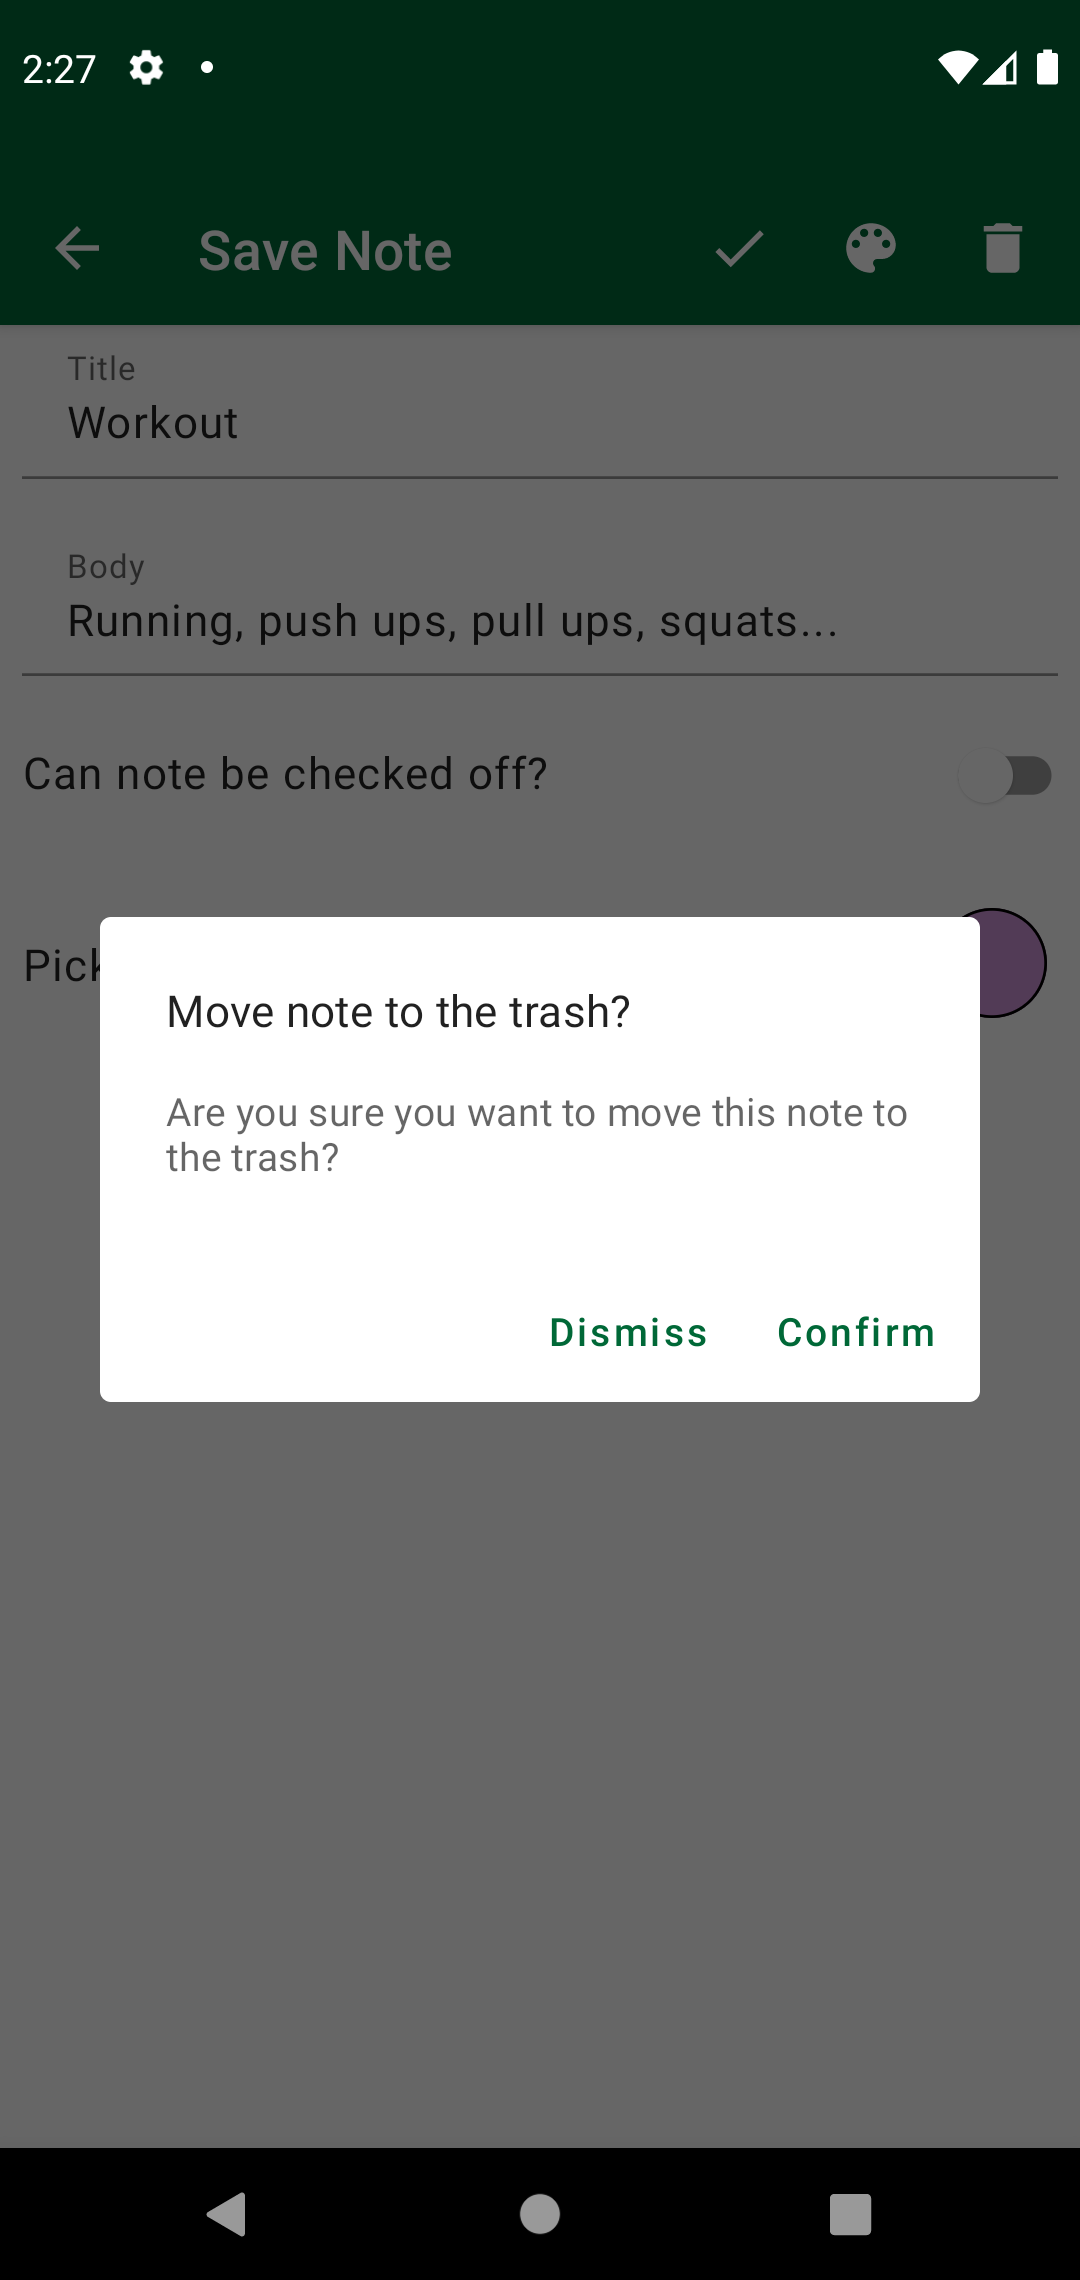 Alert Dialog in Save Note Screen